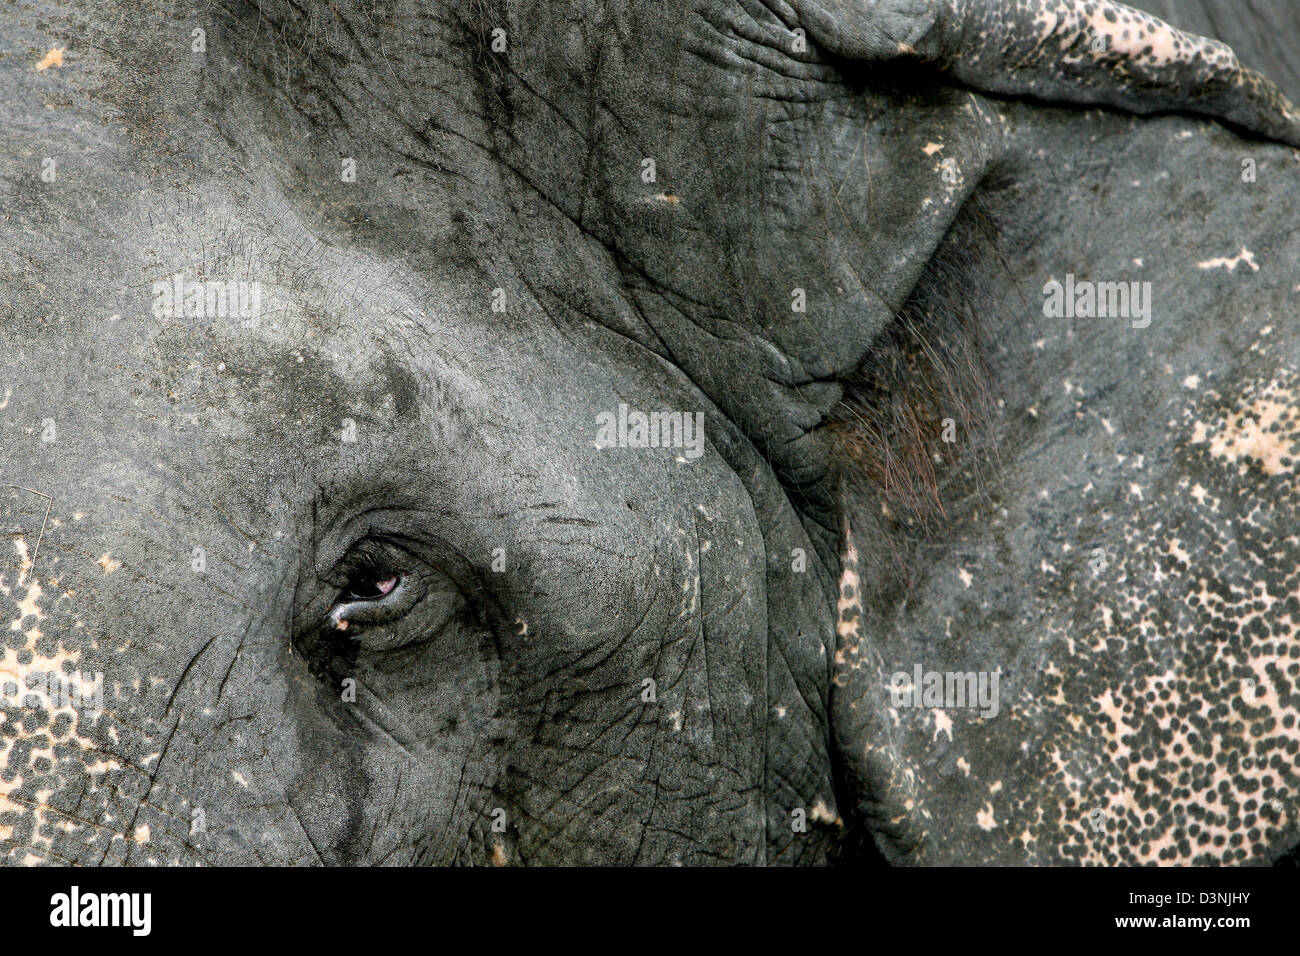 Close up shot of an Asian Elephant (lat.: Elephas Maximus), photographed in Pinnawela on Sri Lanka, 24 April 2006. - Stock Image